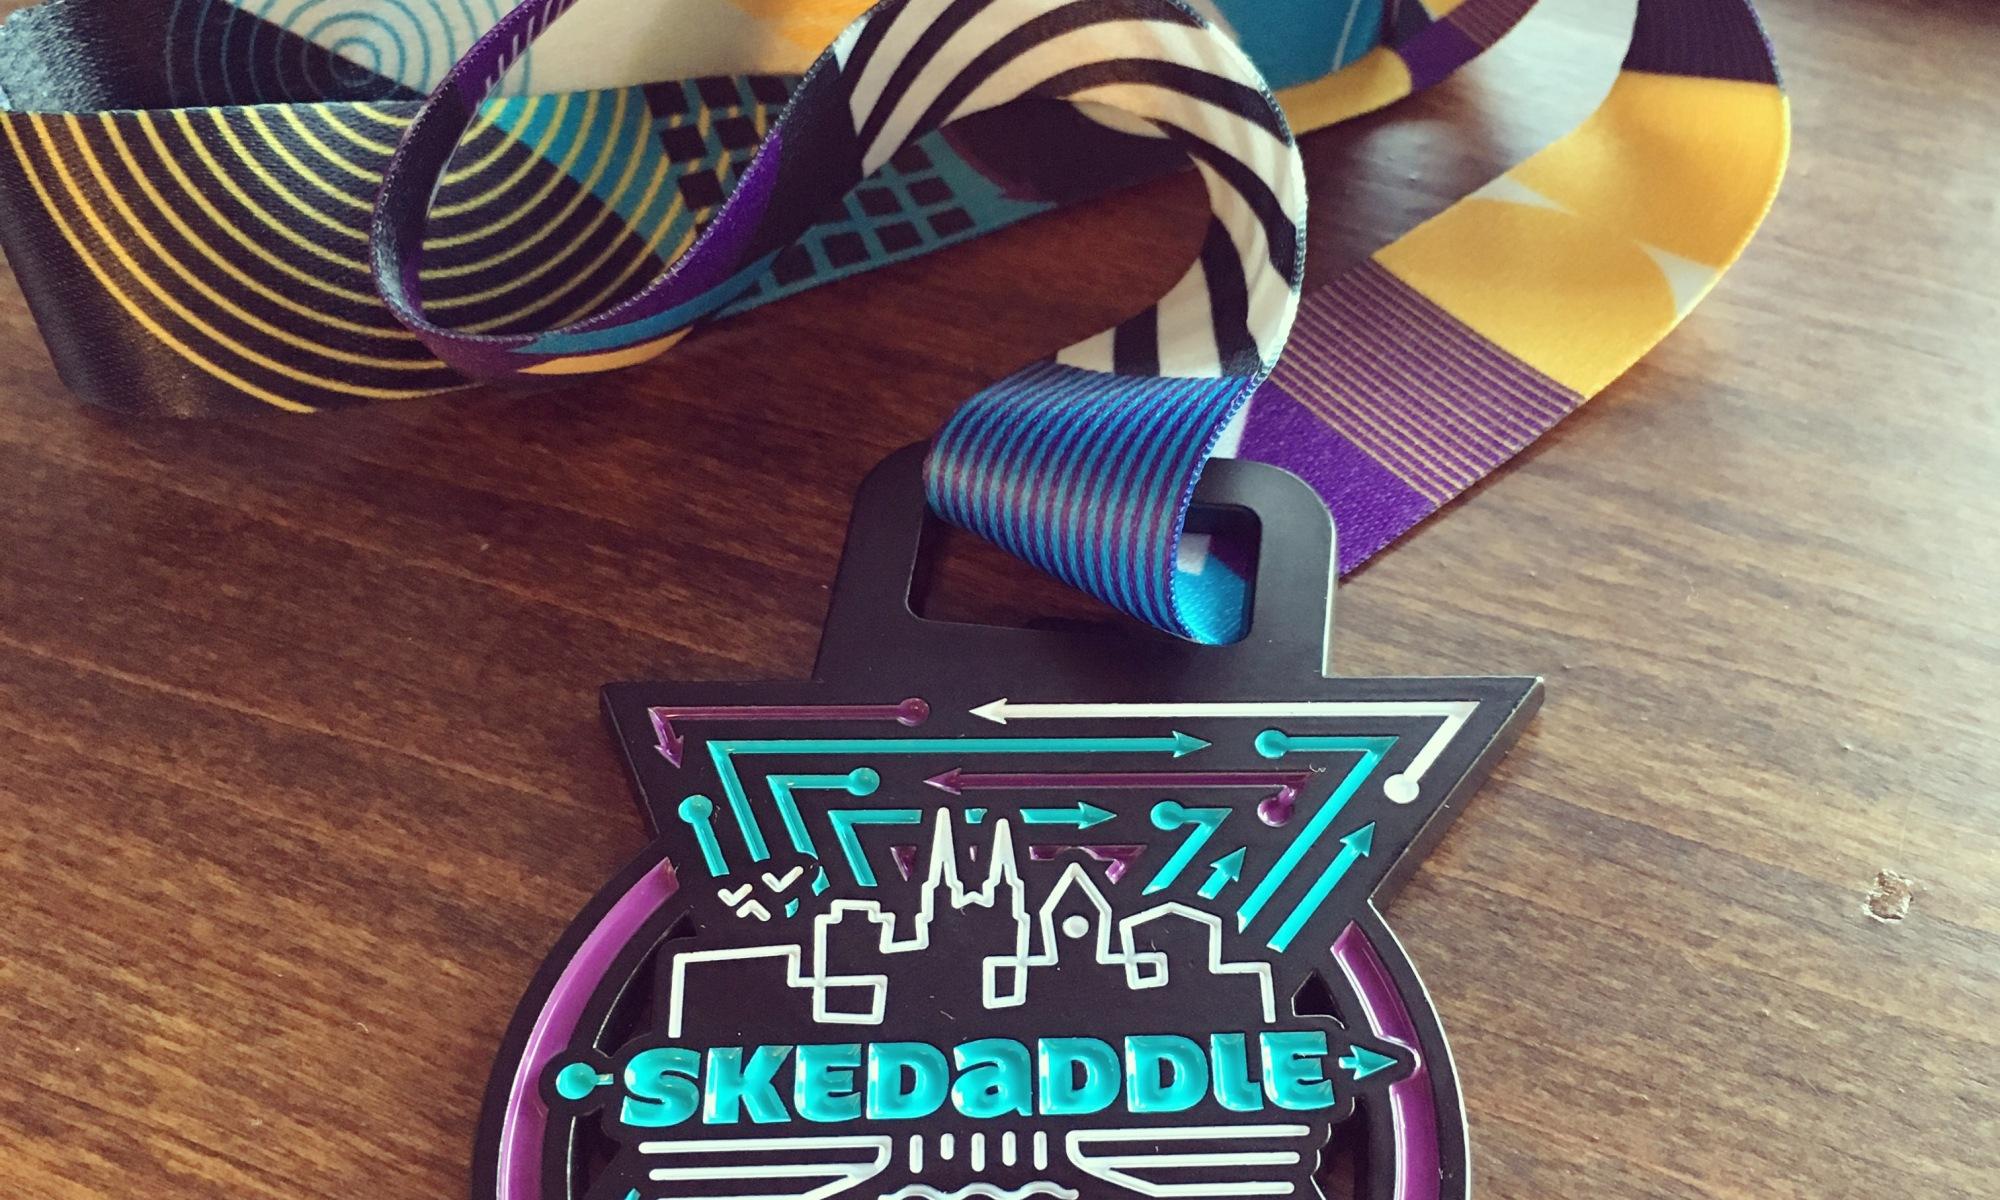 Sioux Falls Skedaddle Medal - Half Marathon 2019